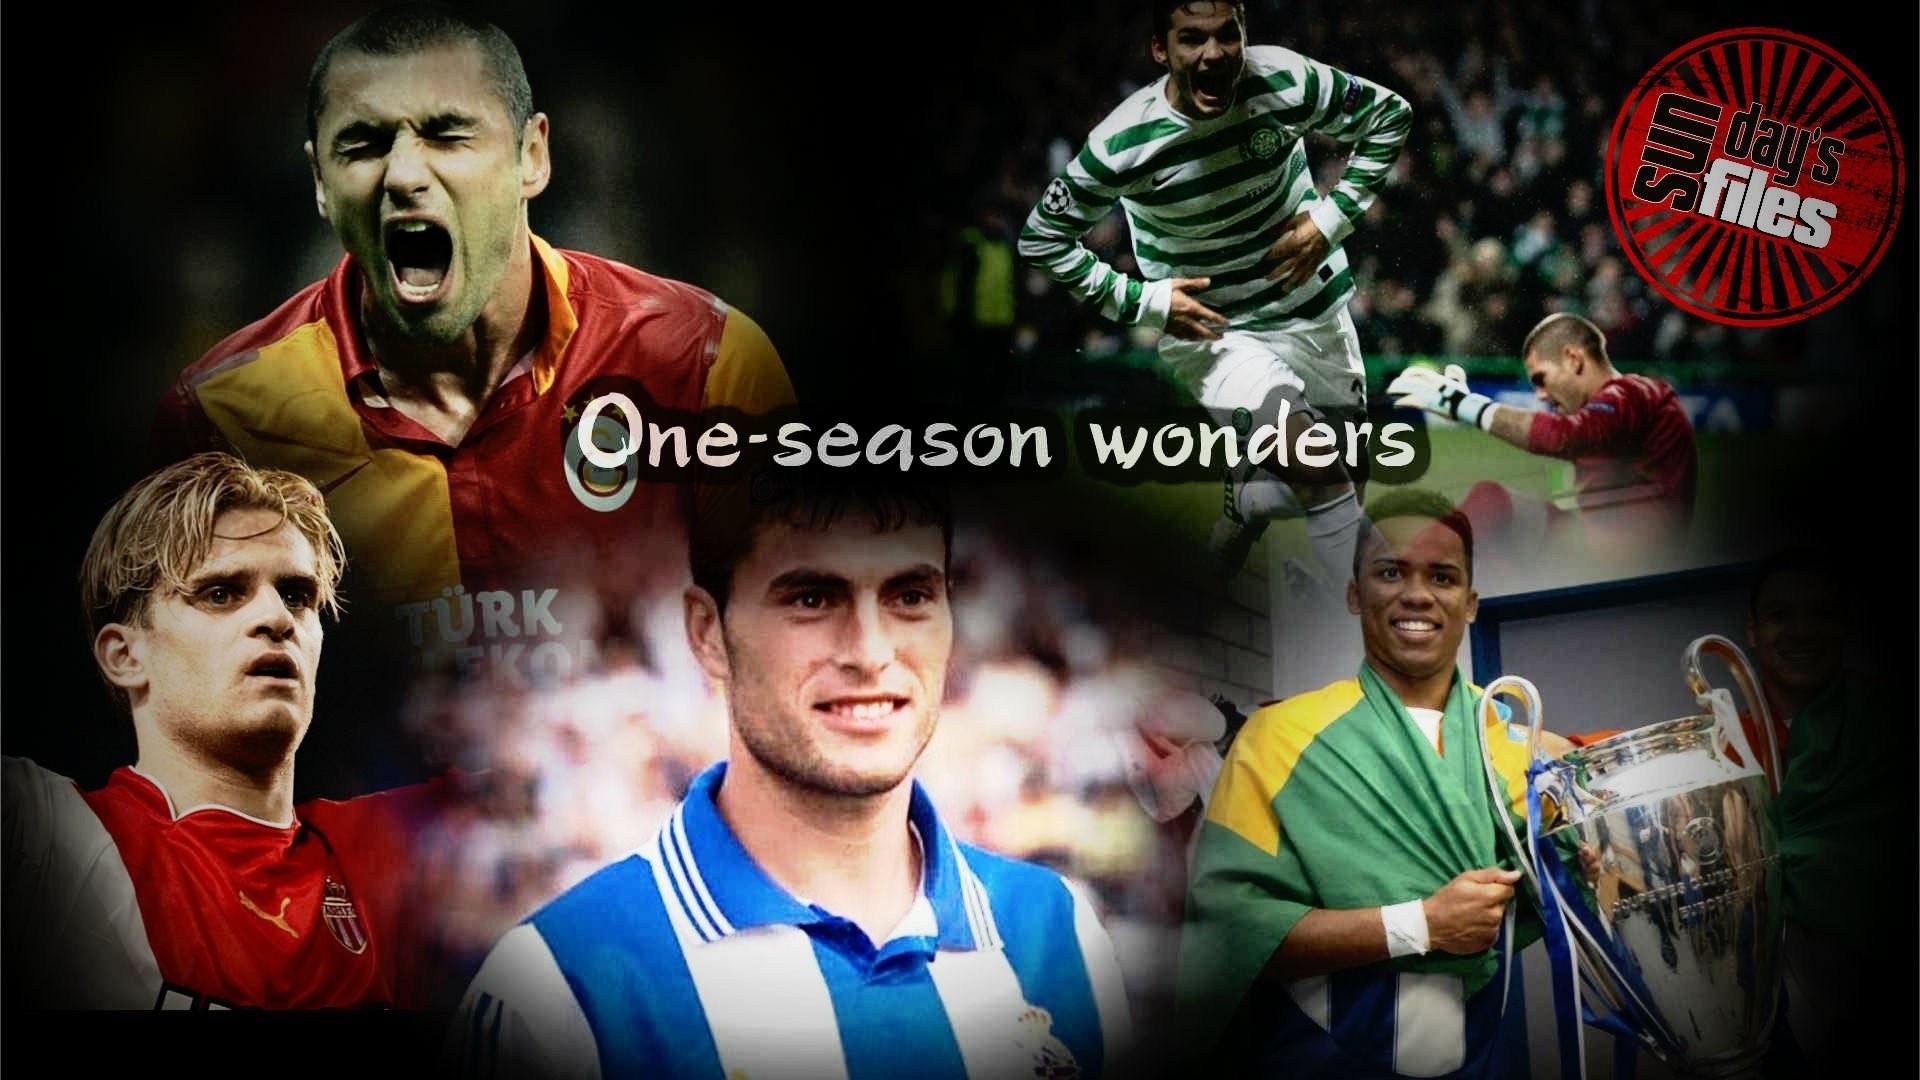 One-season wonders: 10 παίκτες που εξαφανίστηκαν όσο γρήγορα συστήθηκαν στο Champions League